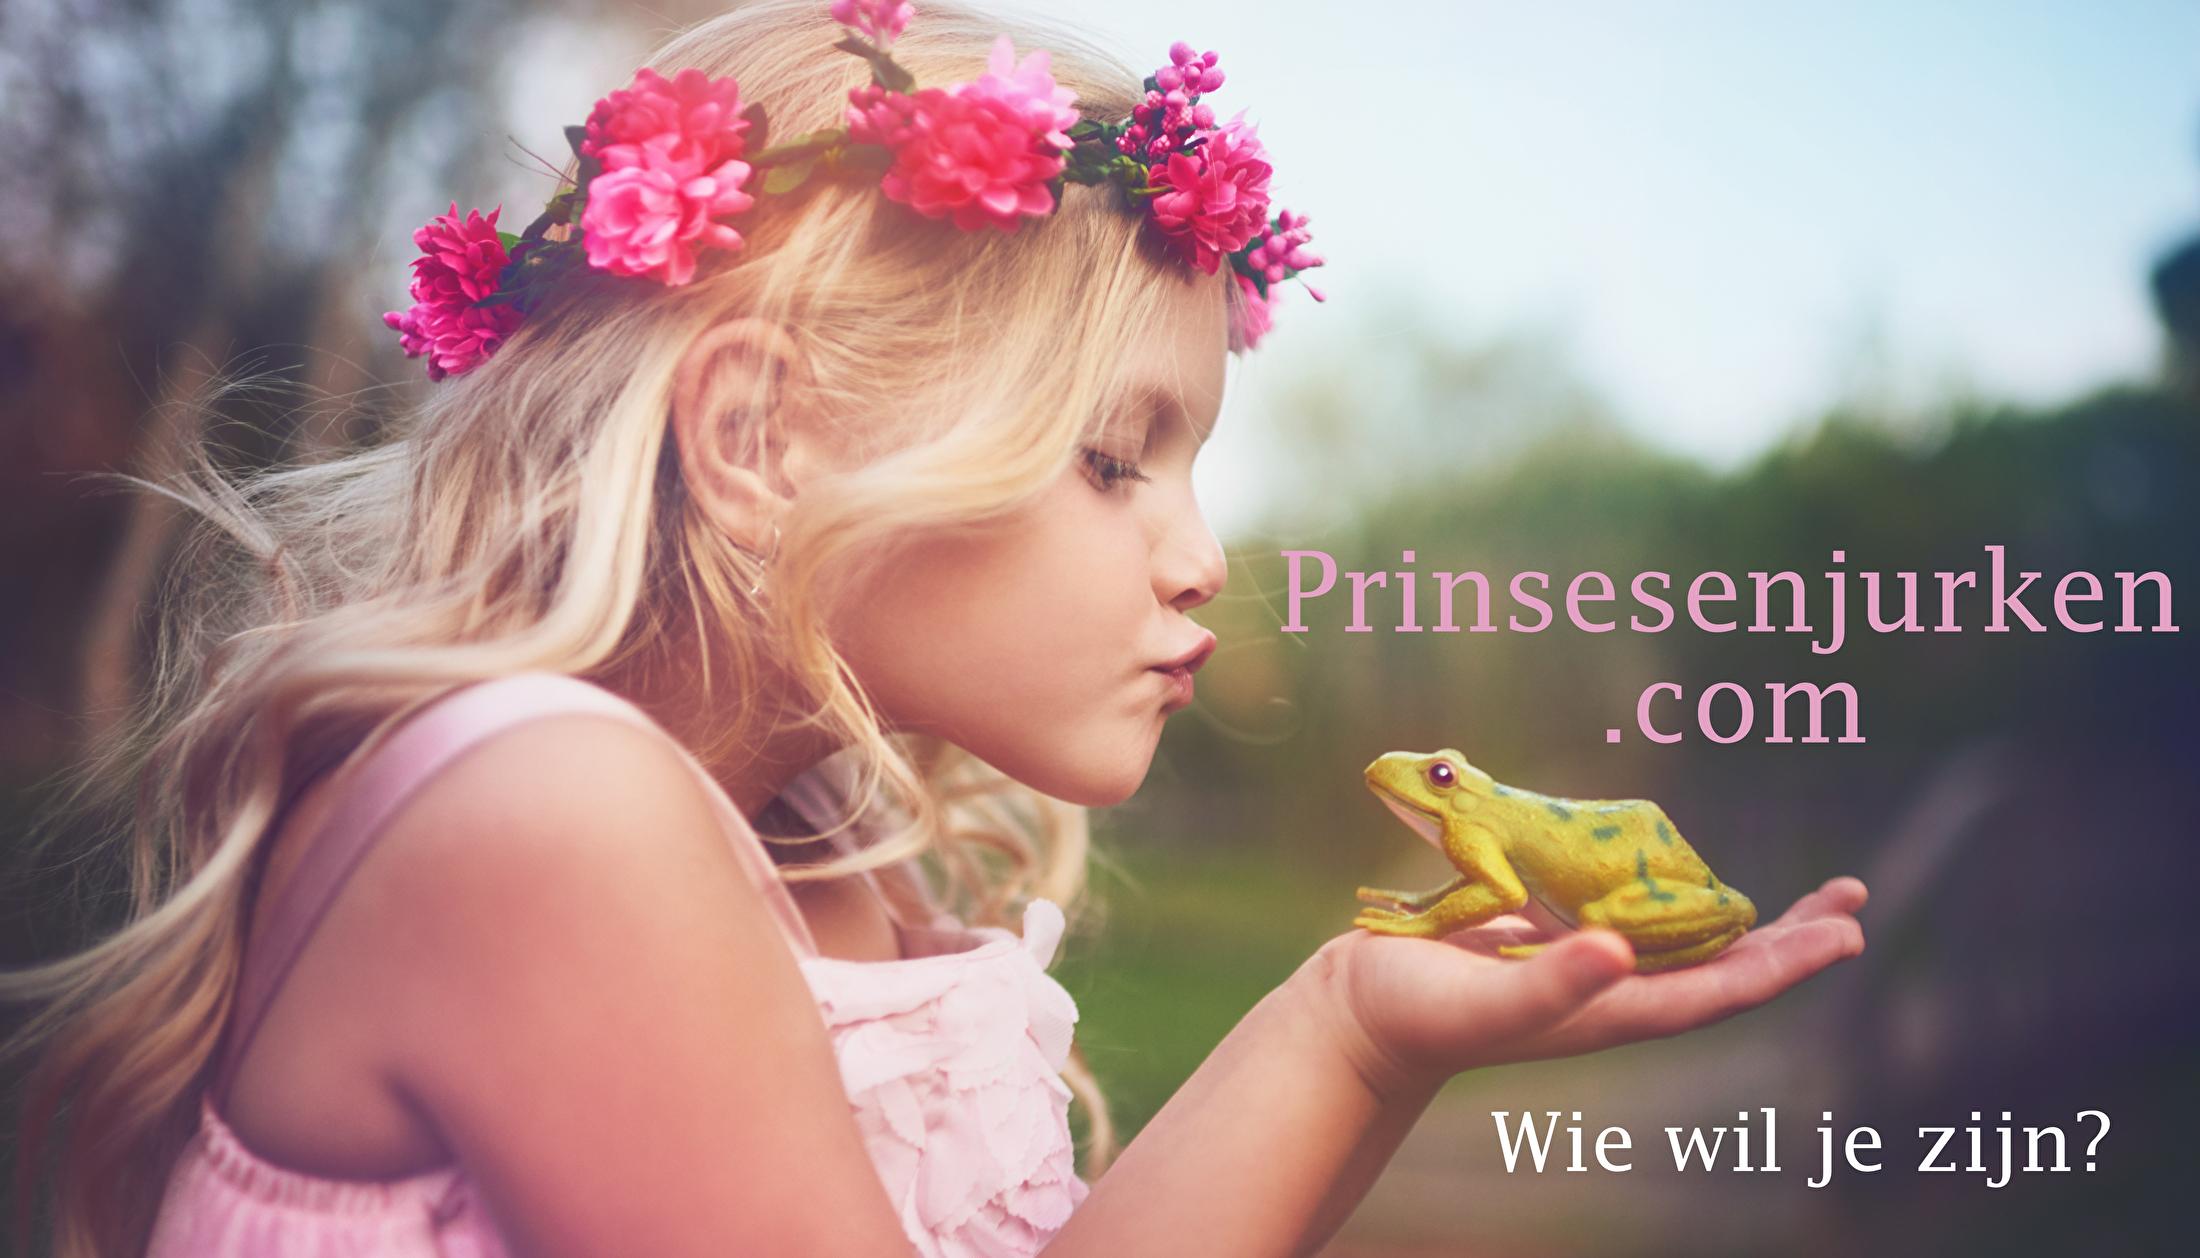 Prinsessenjurken com home header